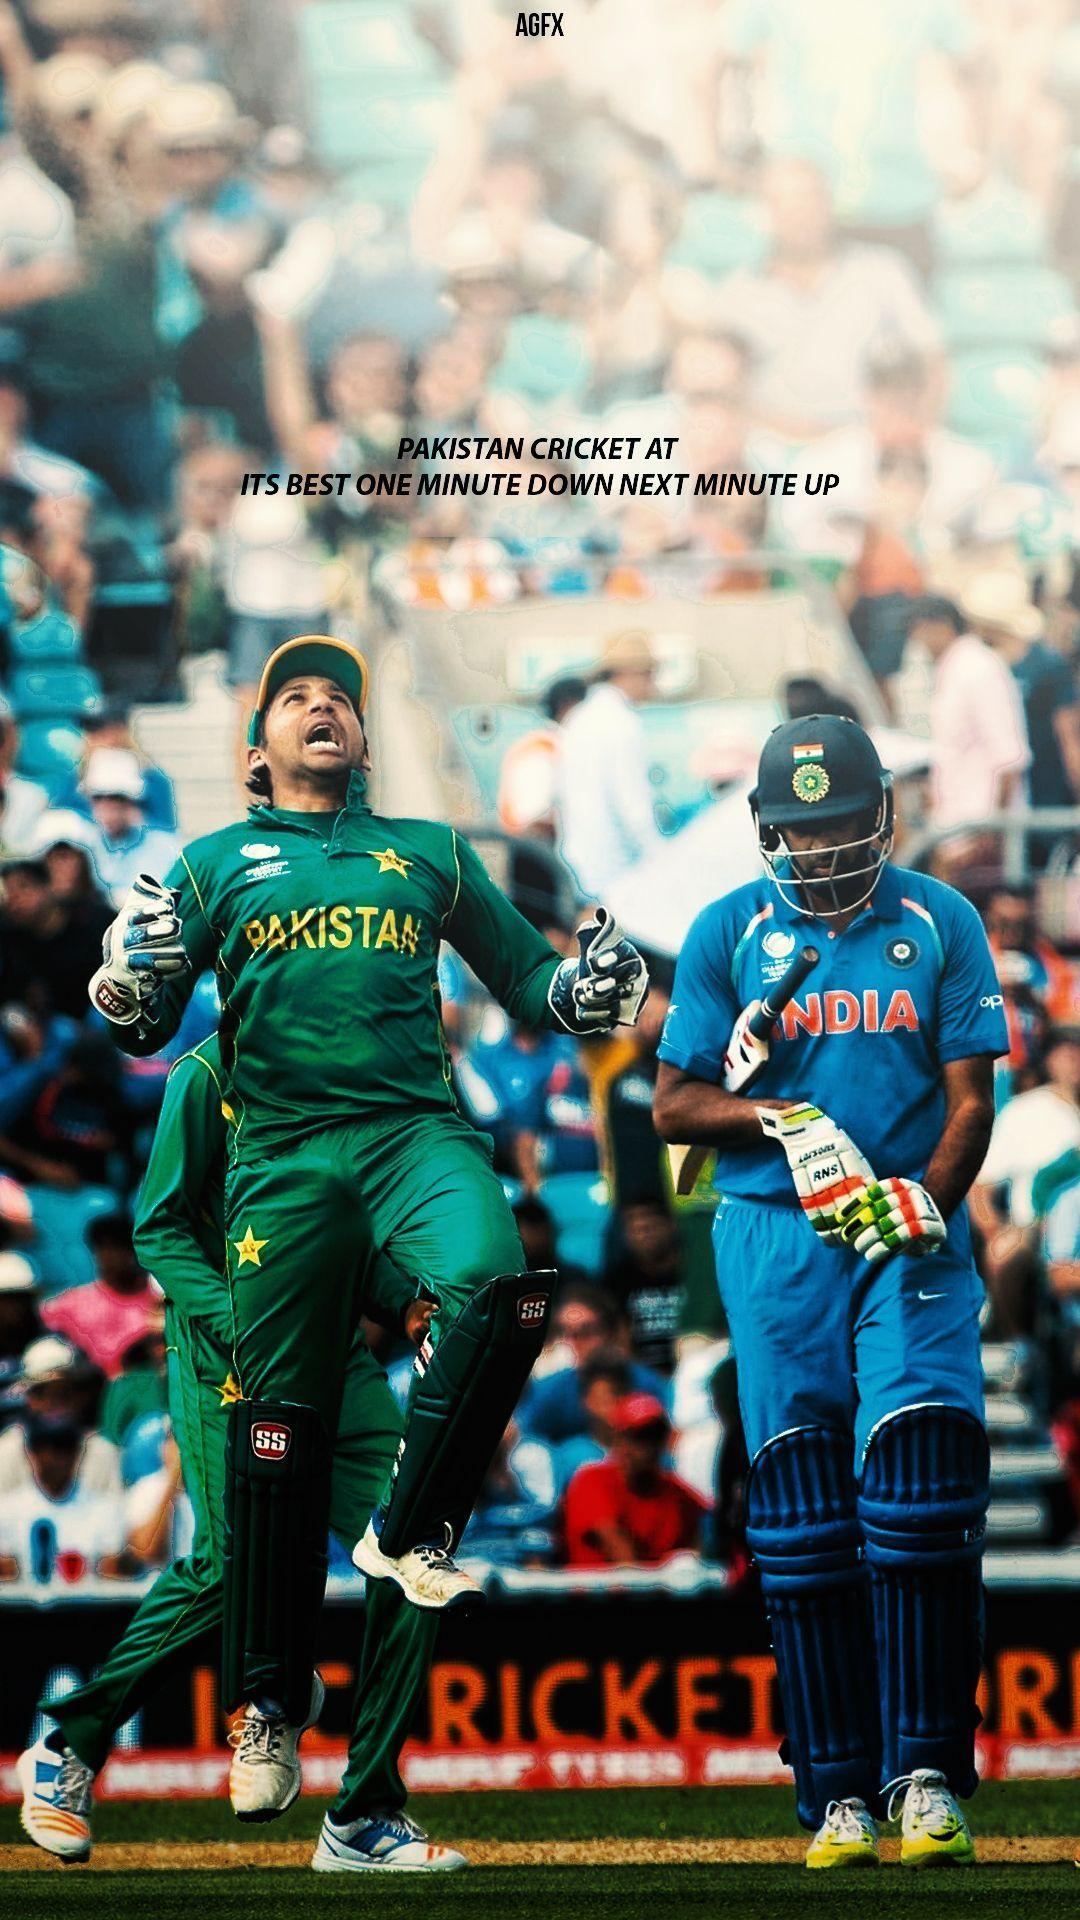 Cricket Watch Live Streaming Cricket Watch Live Streaming Cricketlive Watchcricket Cricketmatches England Cricket Team Cricket Sport Pakistan Cricket Team